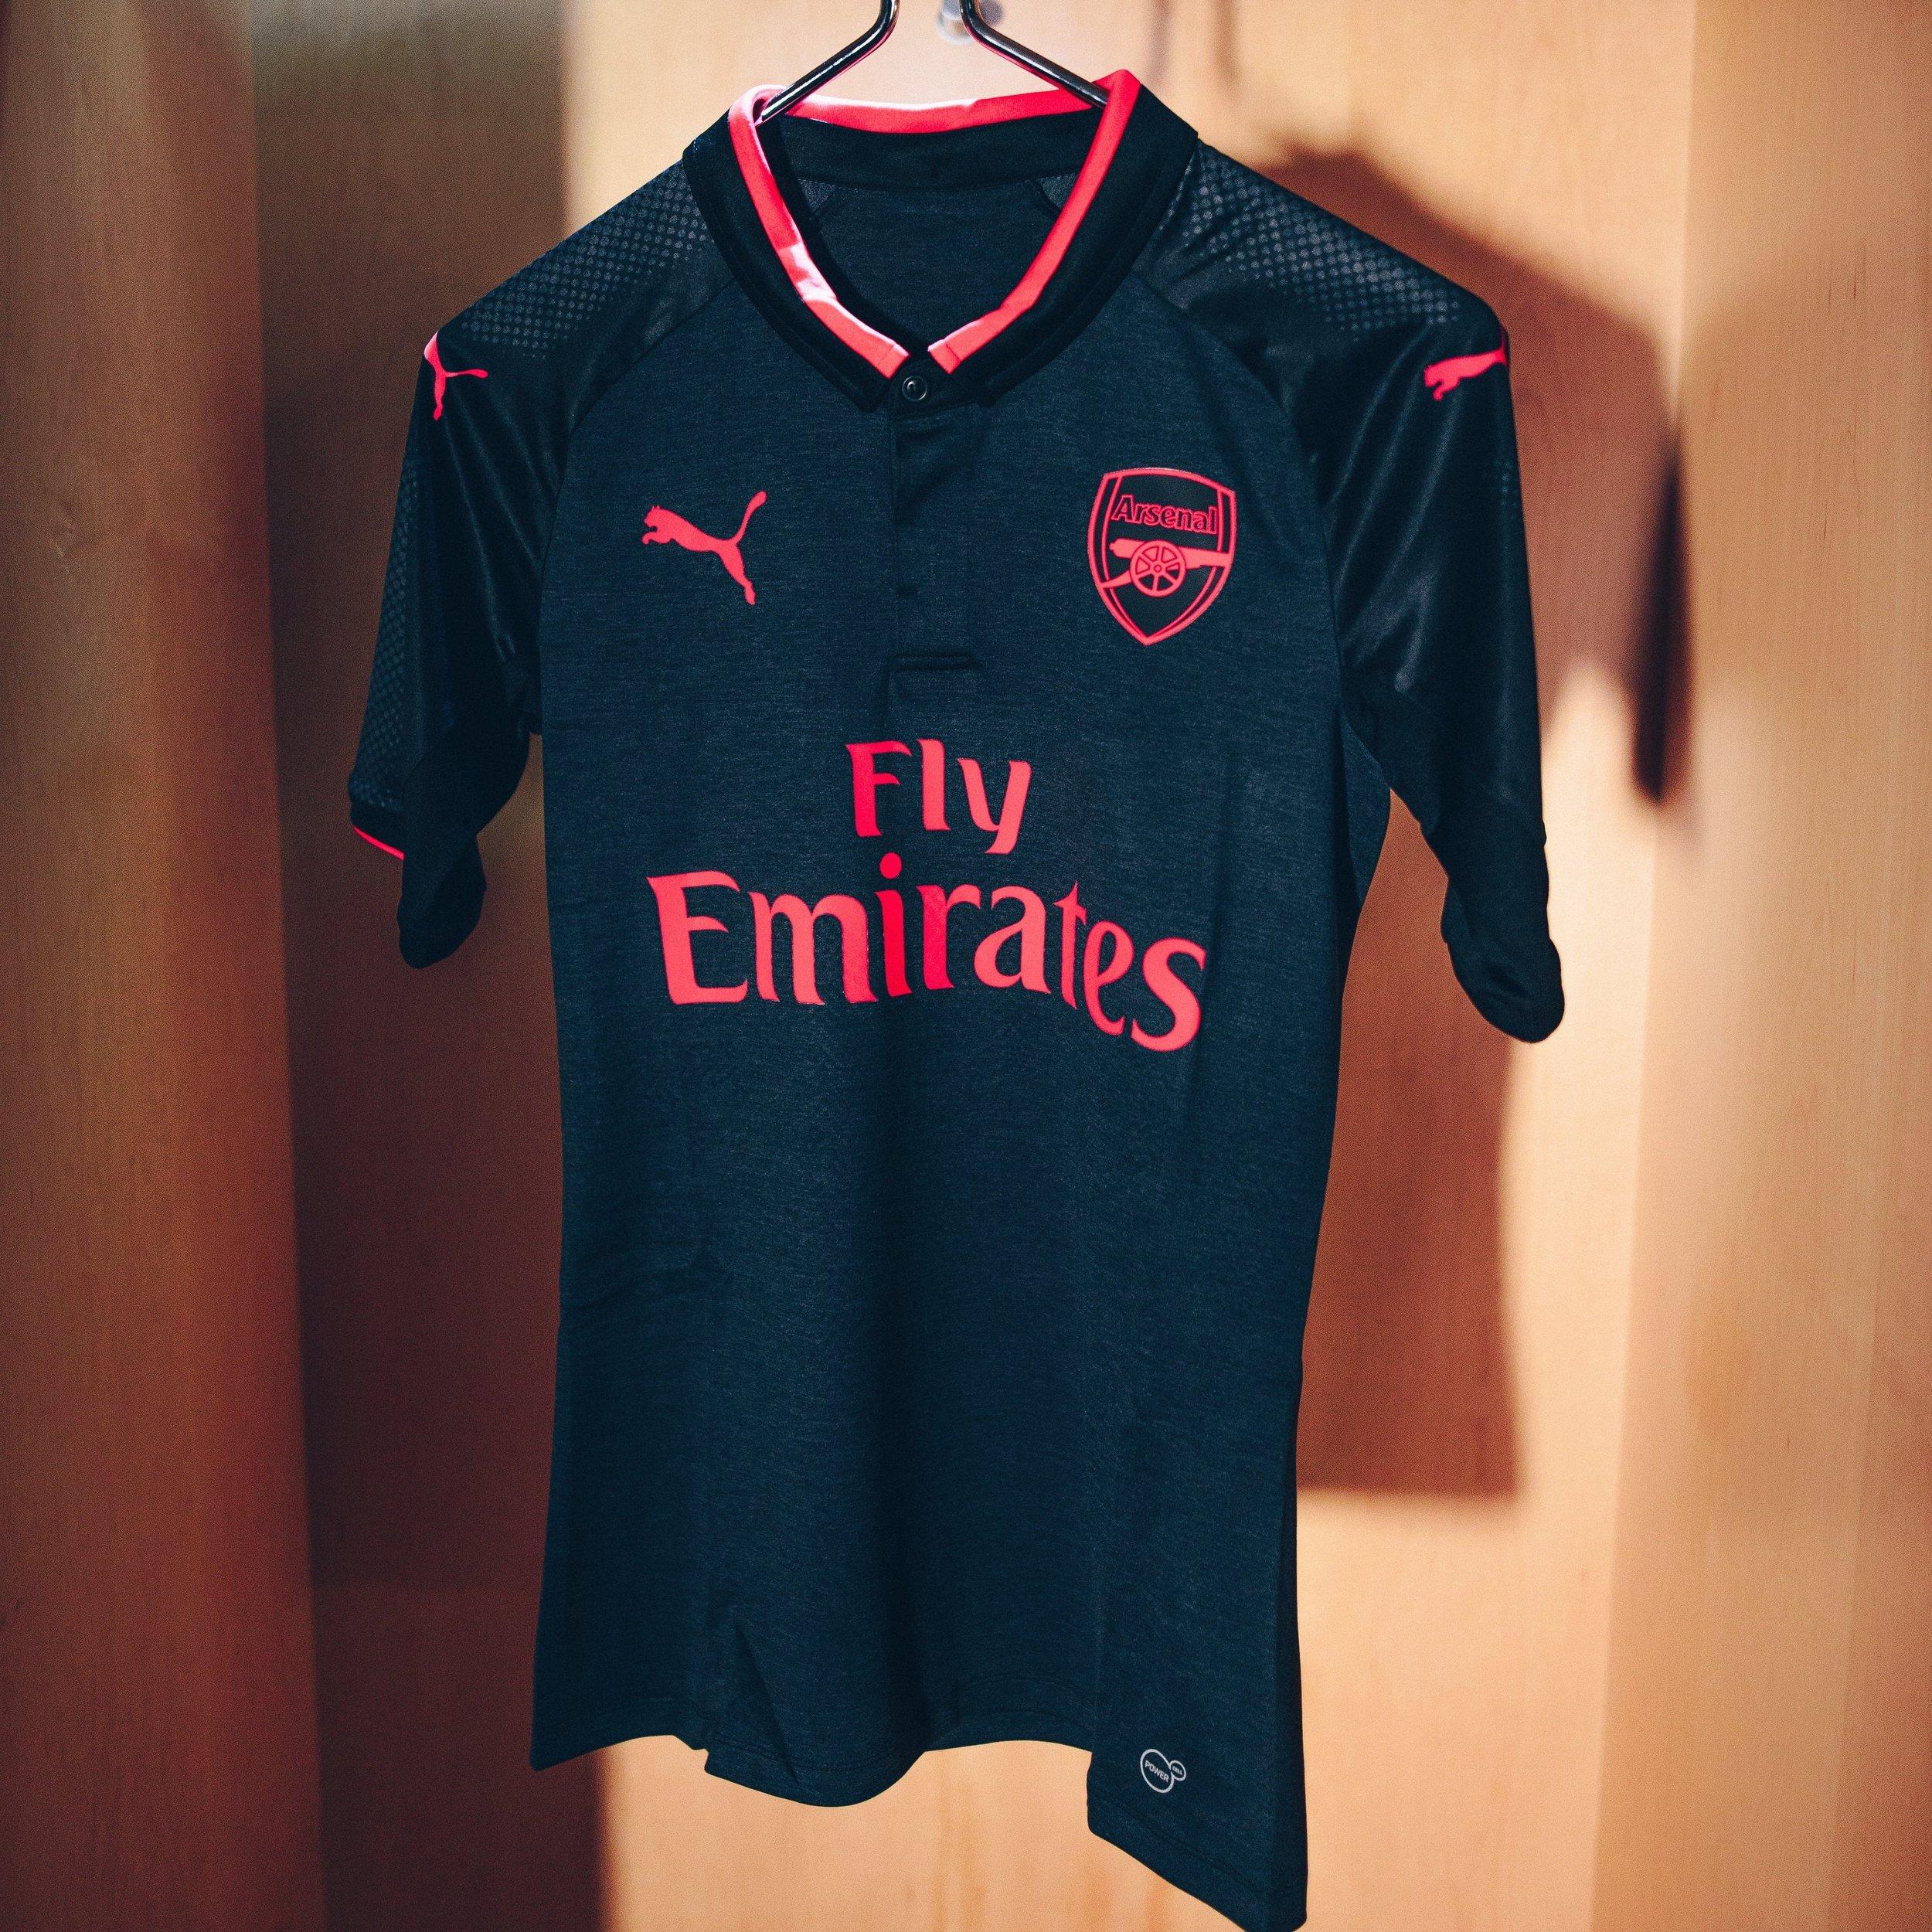 17AW_DIGITAL_TS_Football_Step-Out_xShirt-Only-Arsenal_2-min.jpg